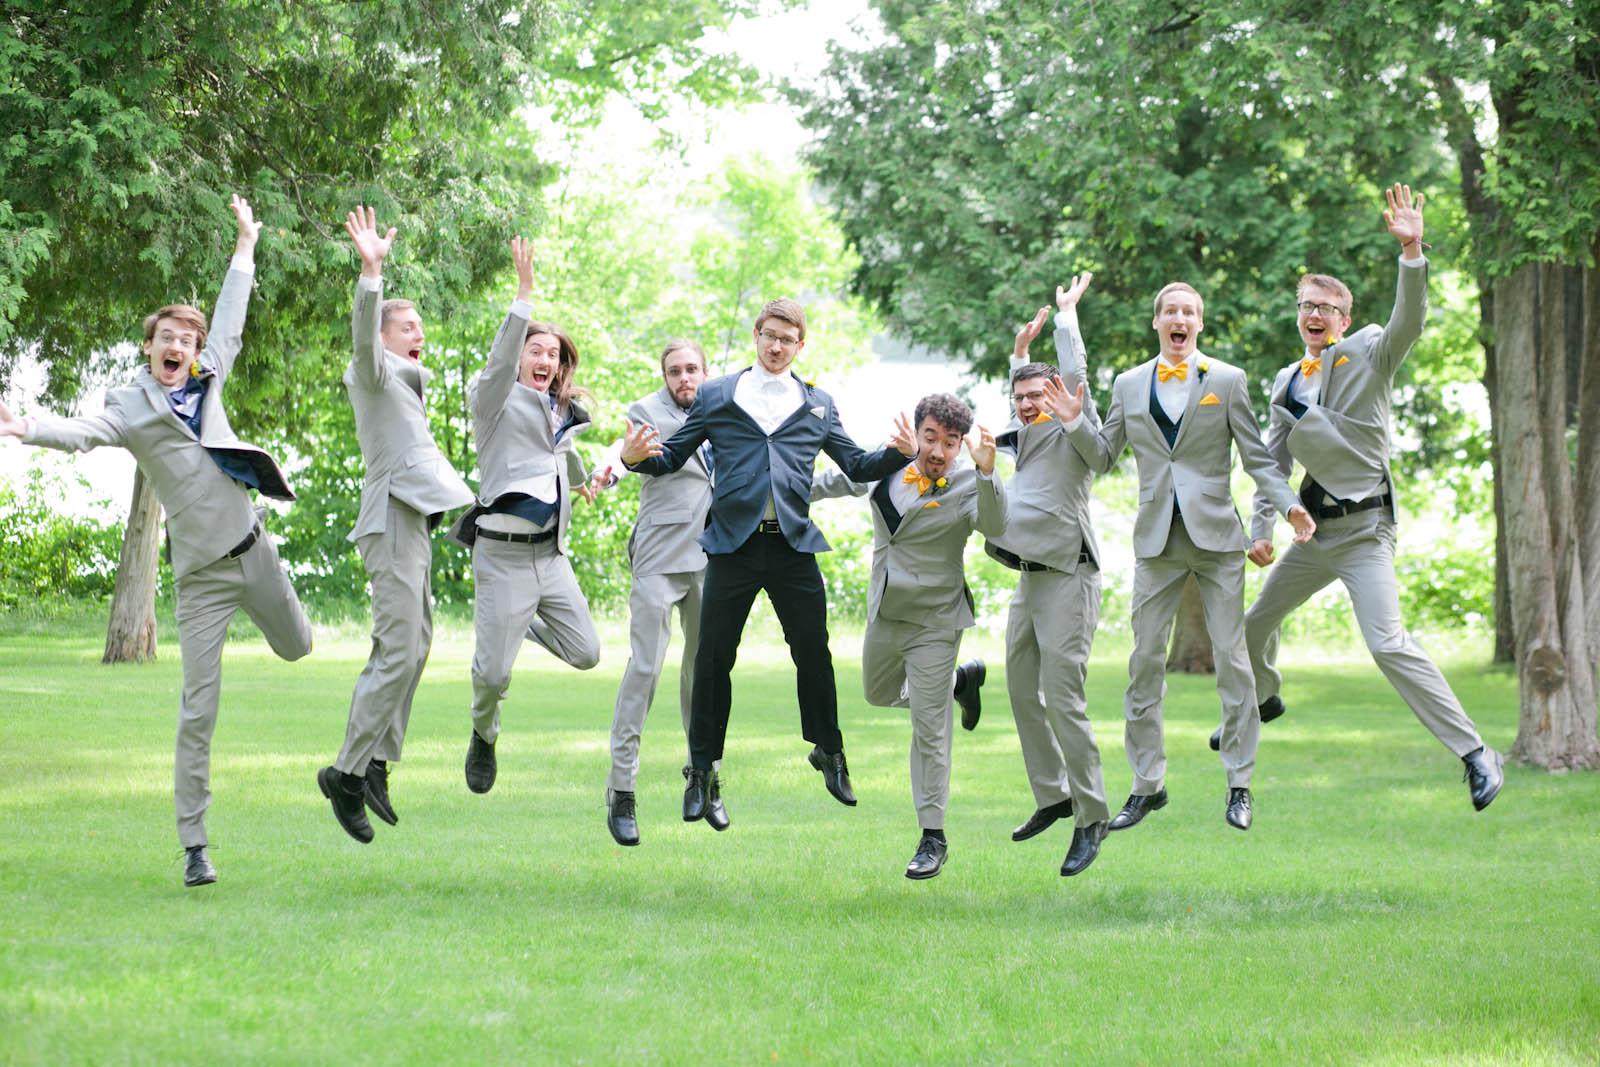 fun groomsmen jumping wedding photo